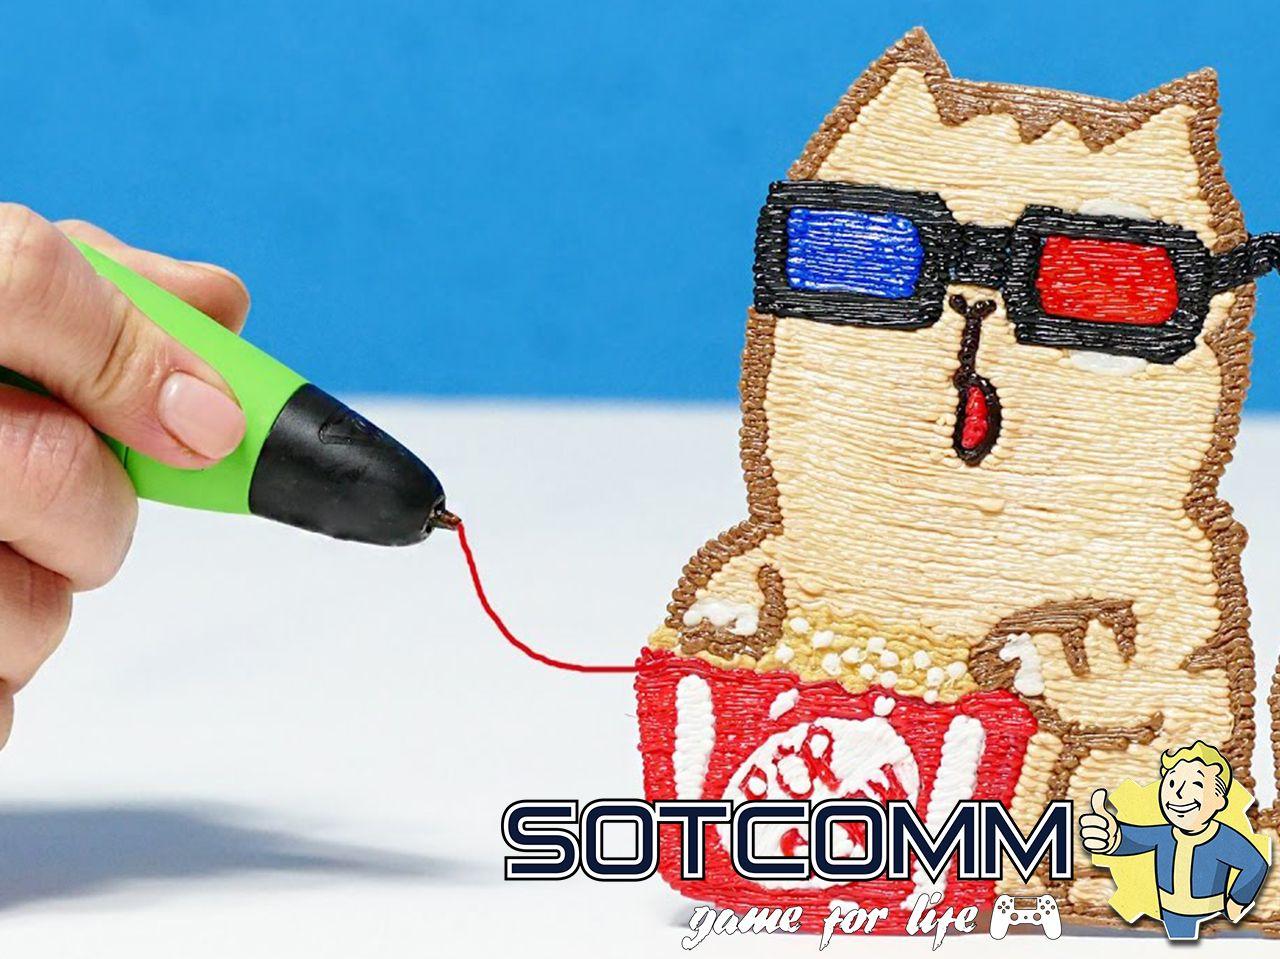 3D ручка 3DPen-2 с LCD дисплеем как рисовать